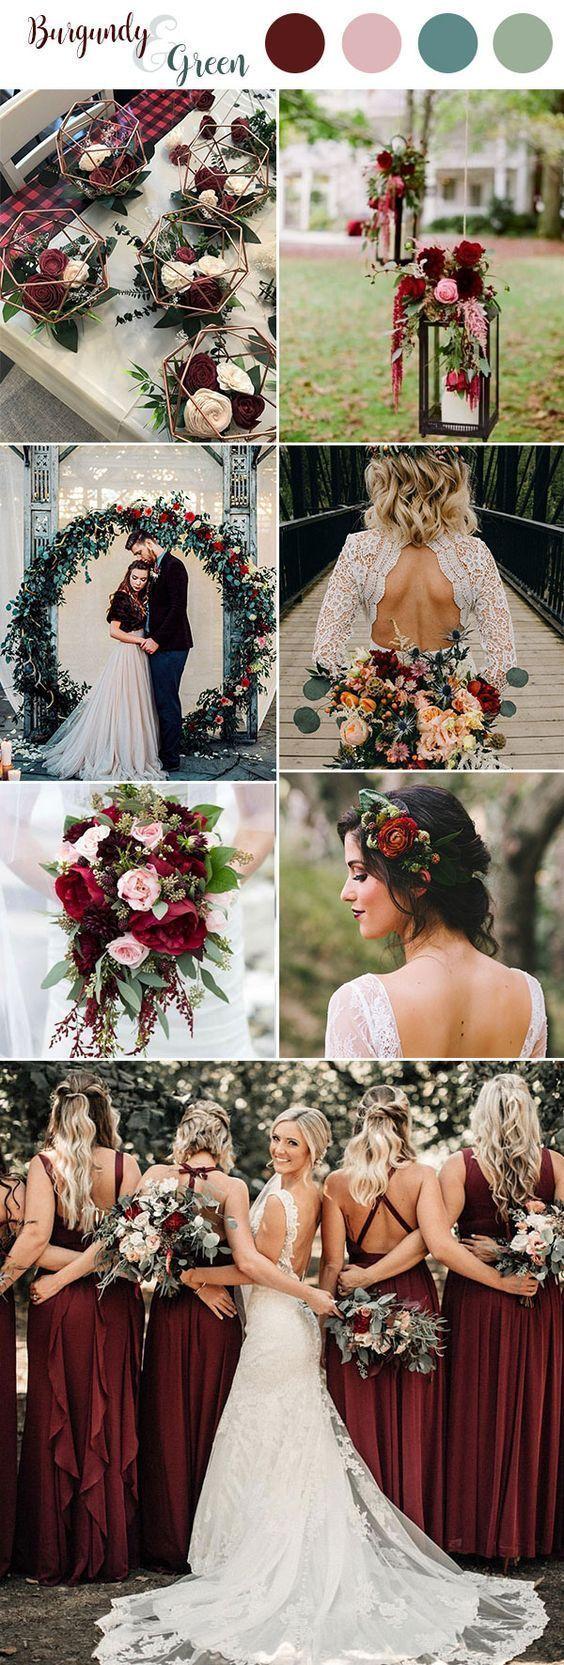 Over 100 Marsala / Burgundy color combinations for Fall 2019 wedding ...